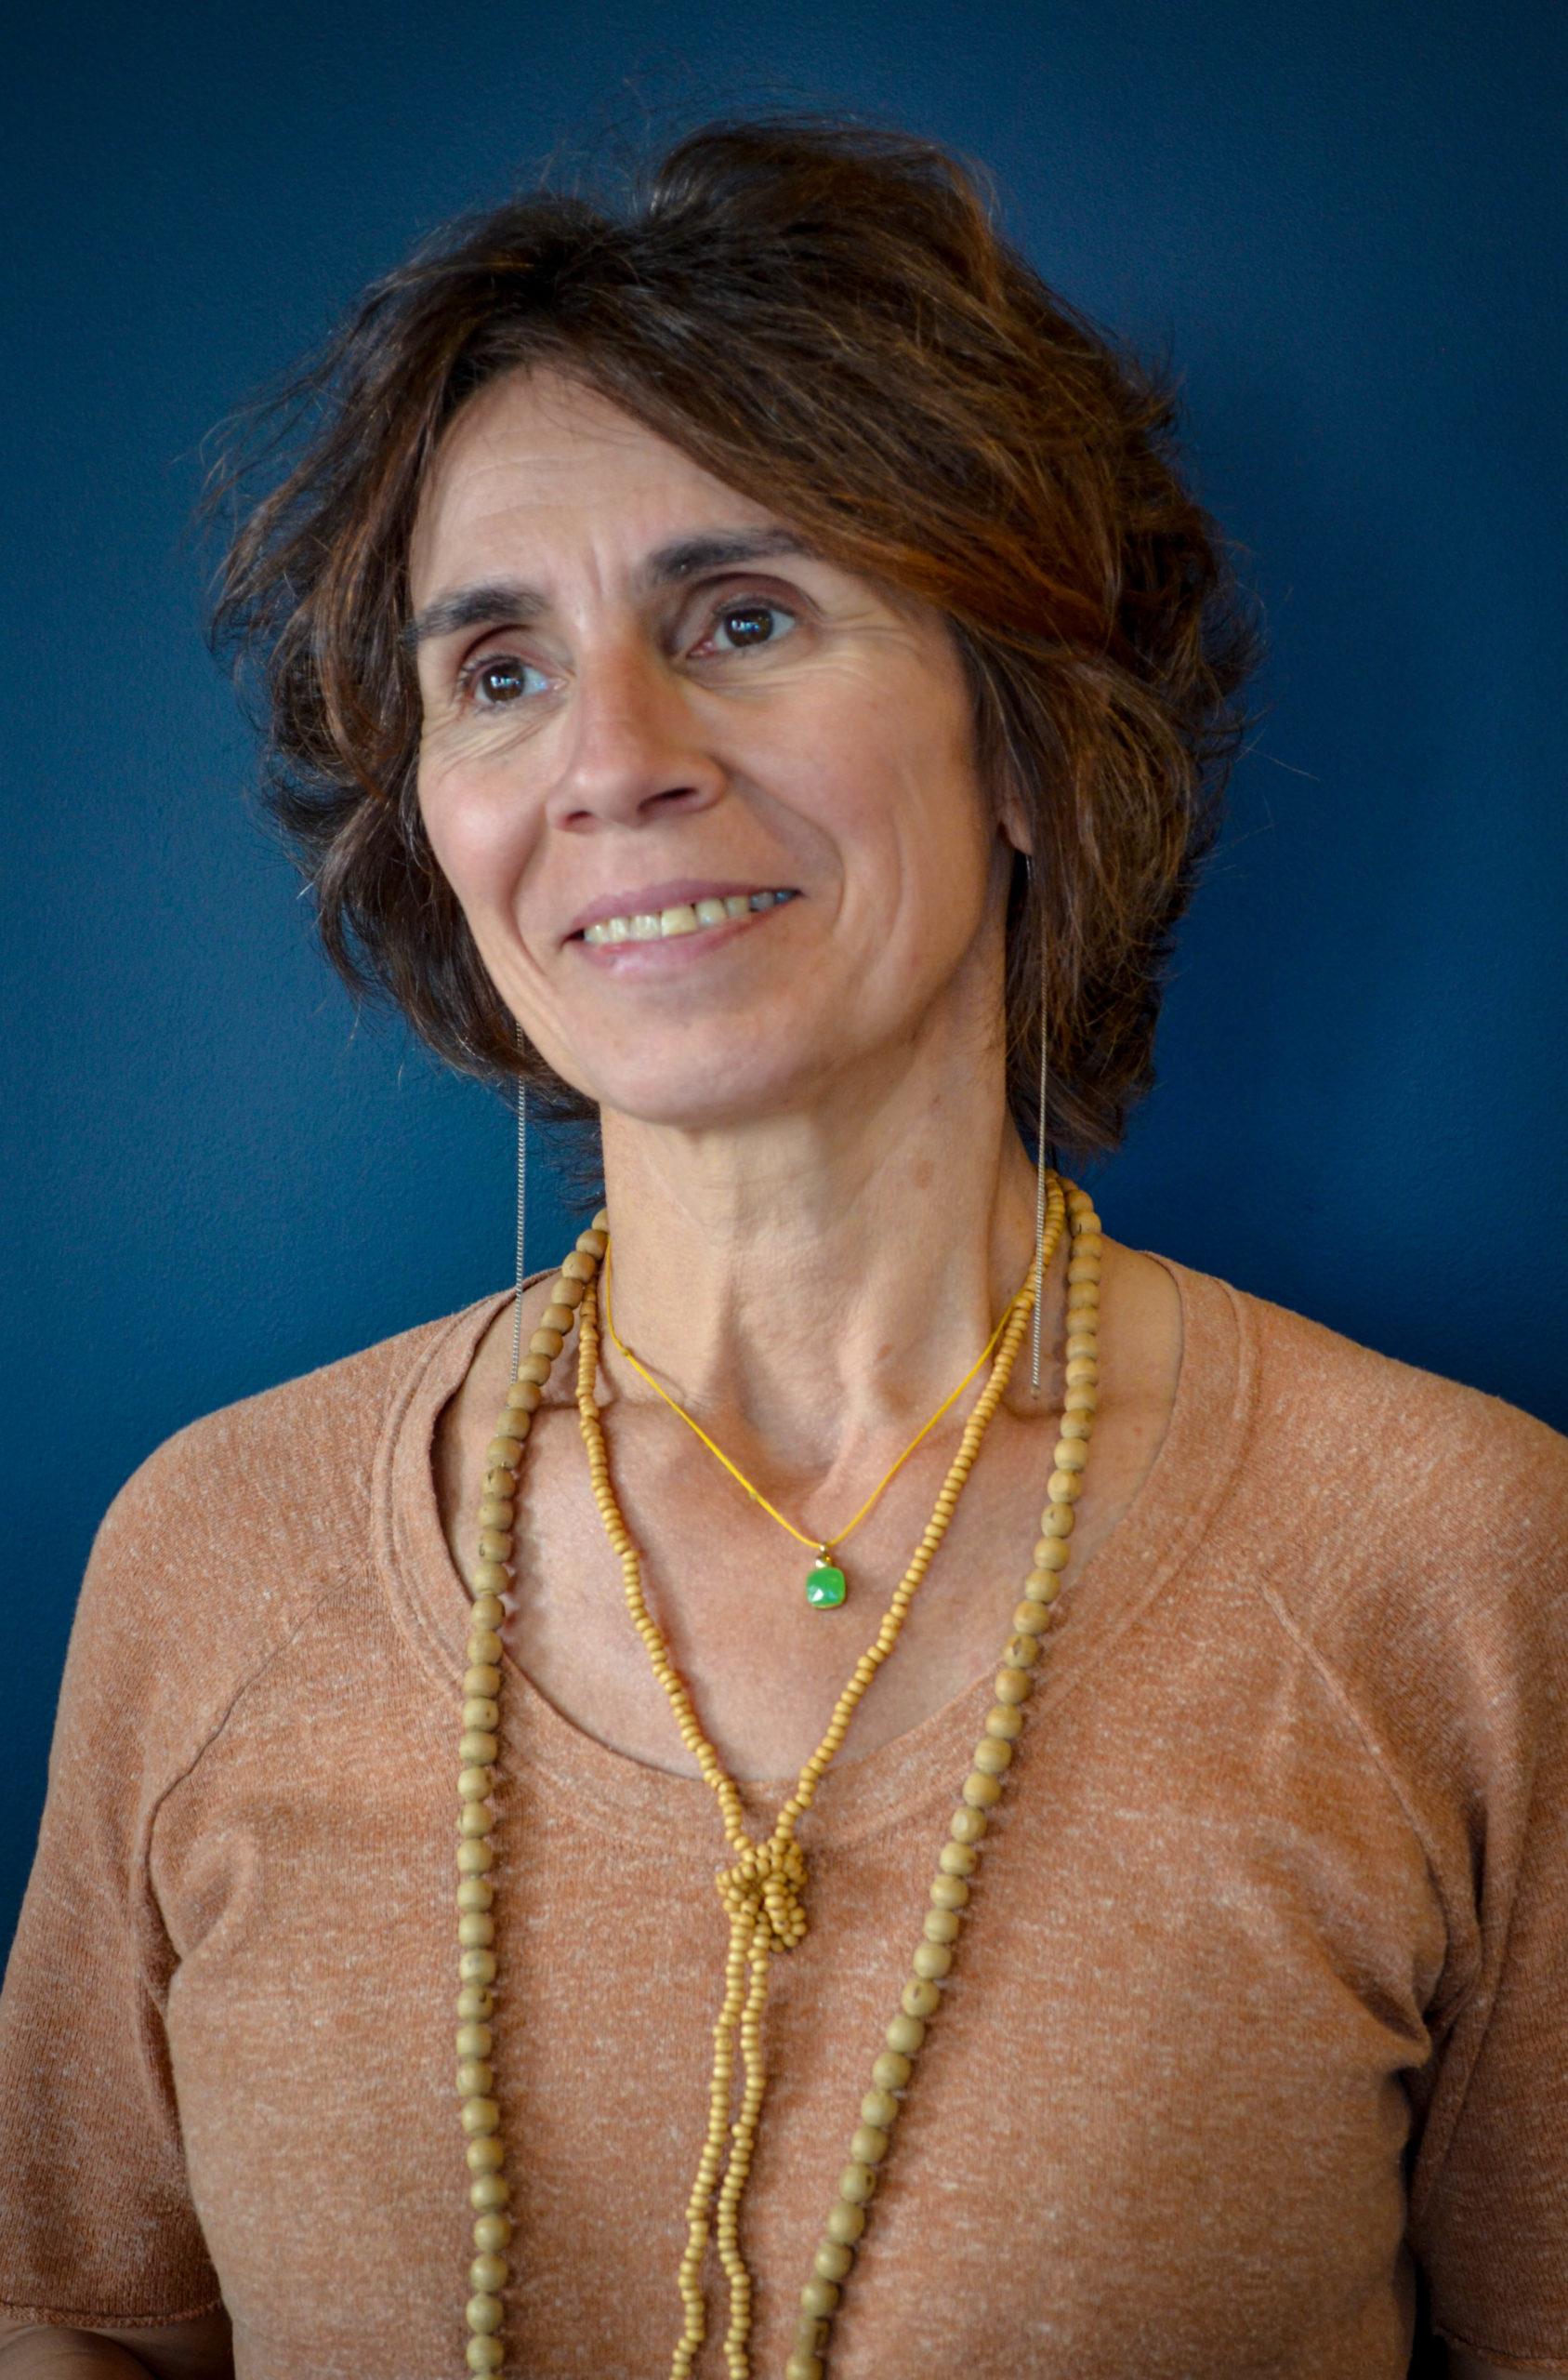 Lydie Cuminetti